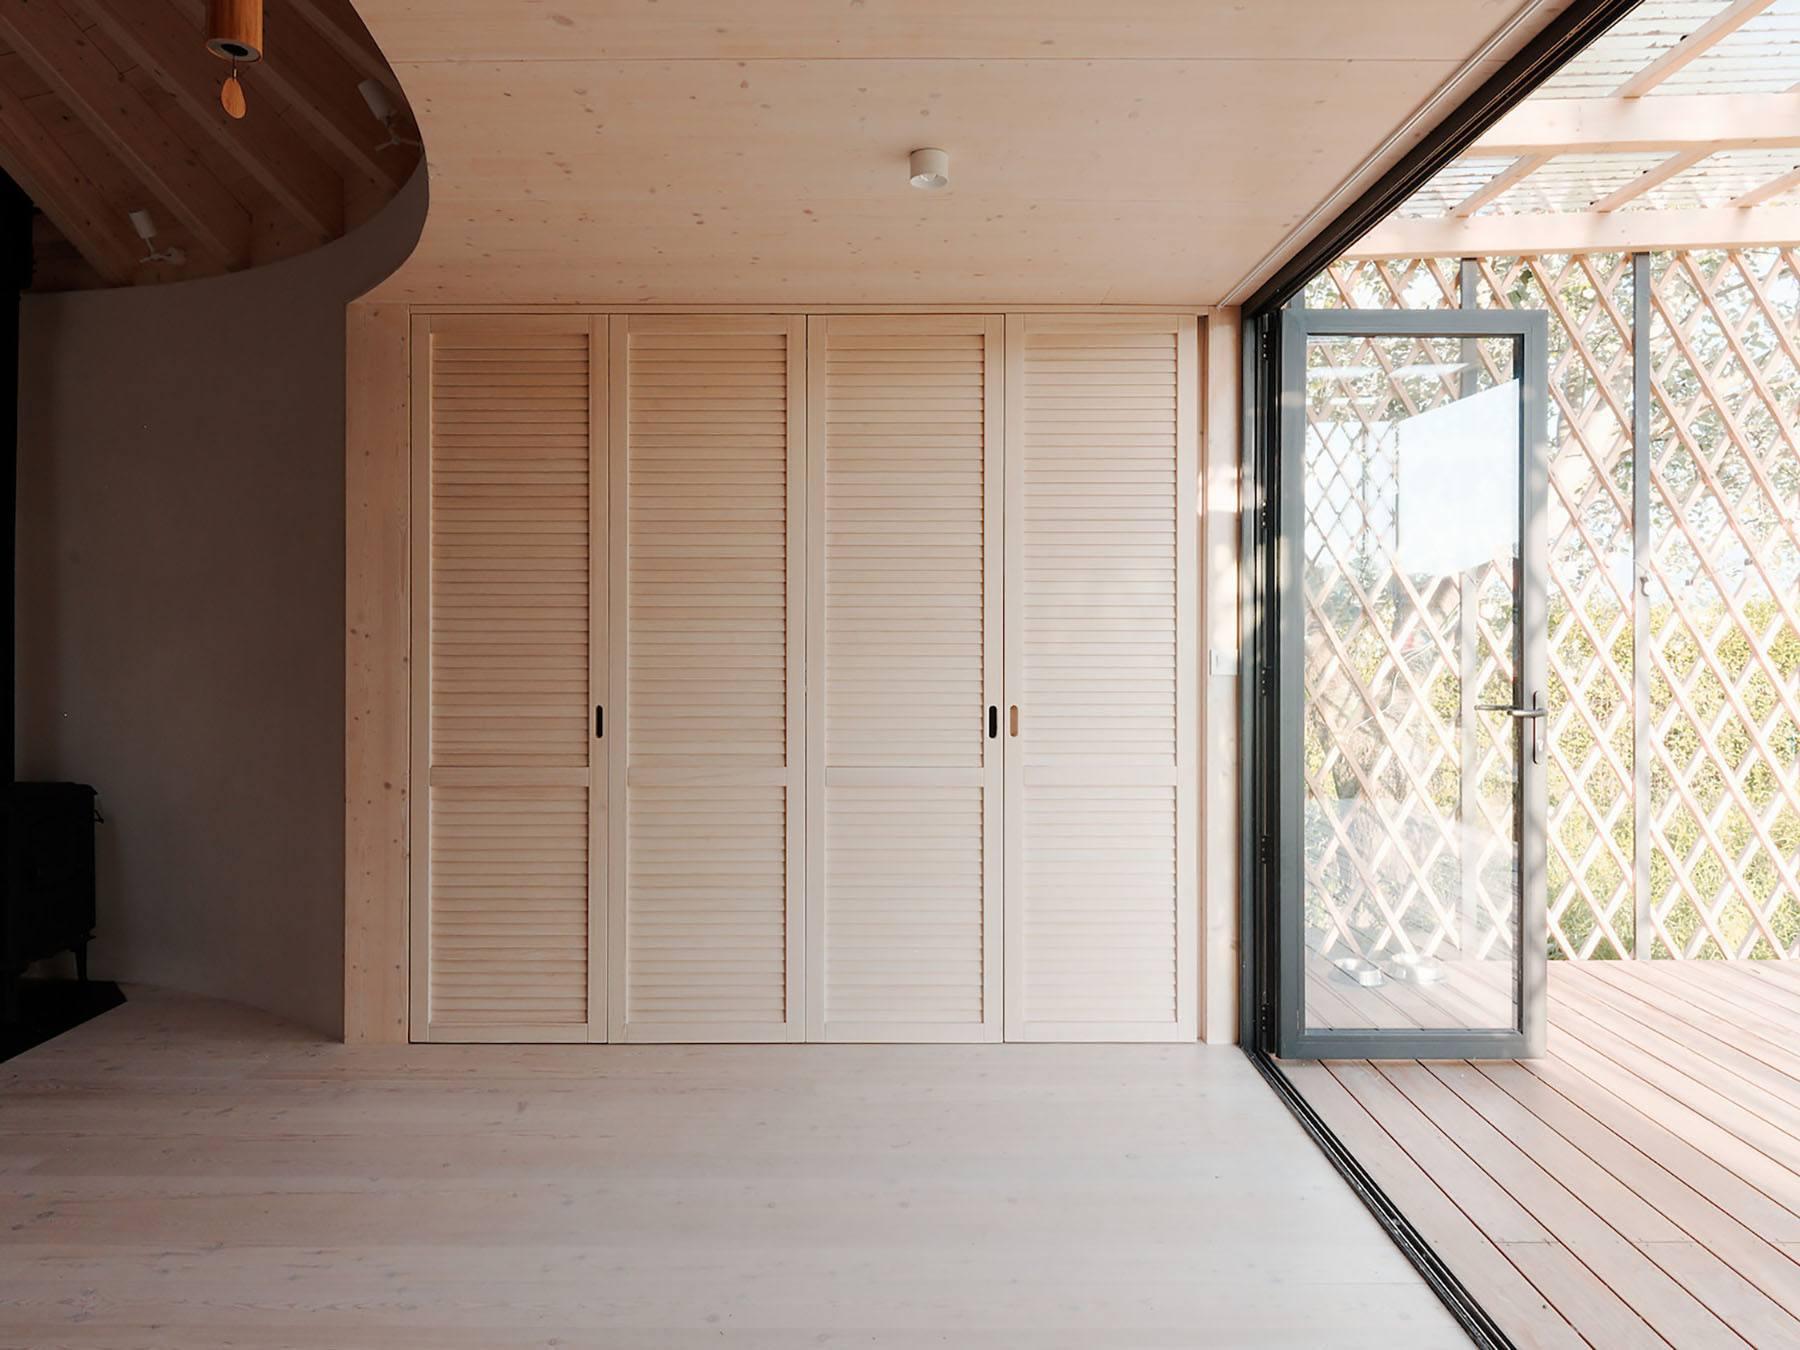 IGNANT-Architecture-JRKVC-Attila-12